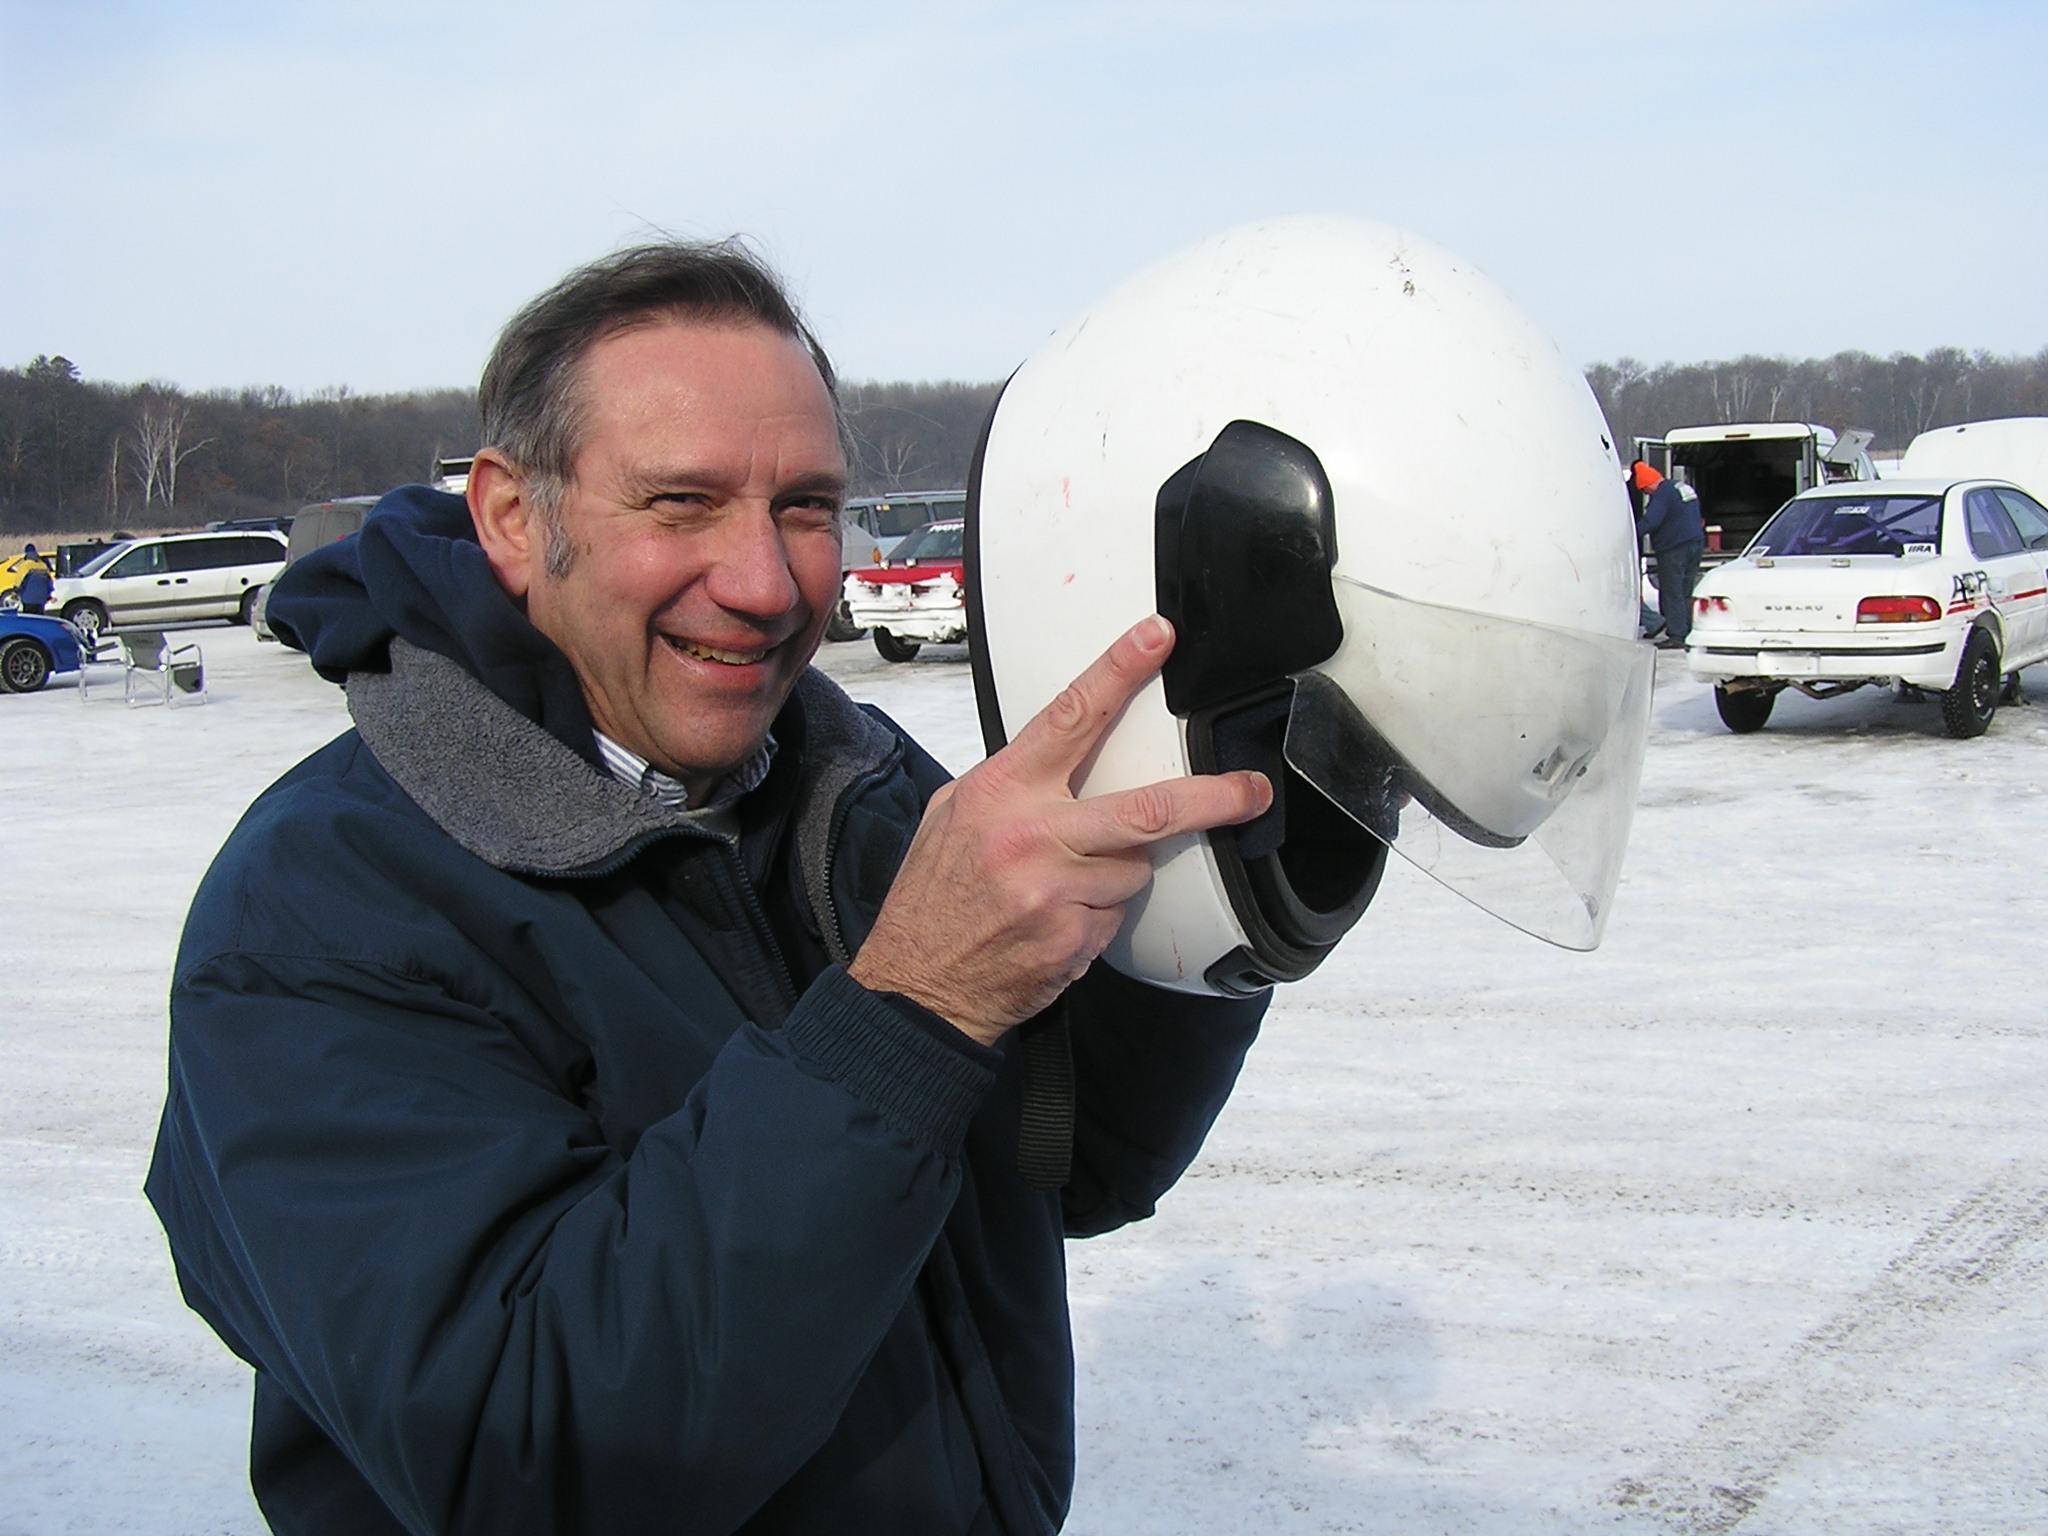 Ed prepares for his ice racing ride along in Brainerd, Minnesota.